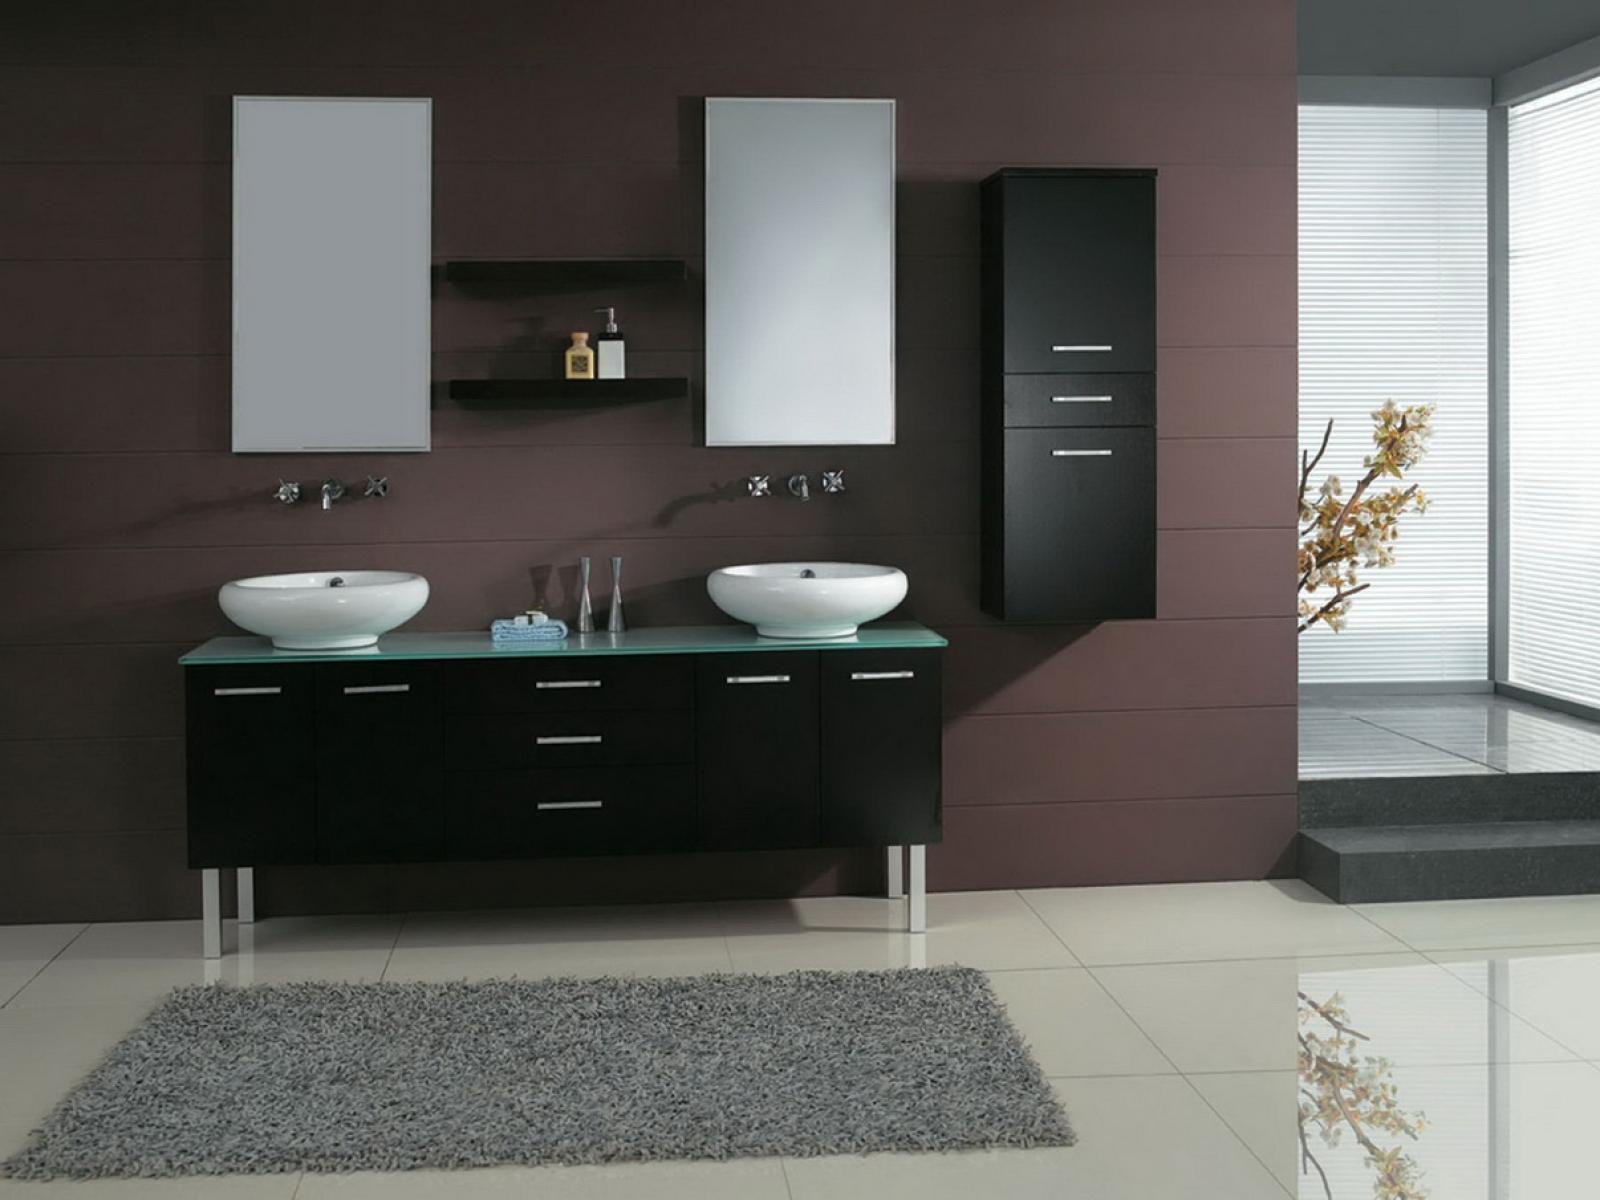 Custom Bathroom Cabinets Miami Fl - CUSTOM CABINET MAKERS ...